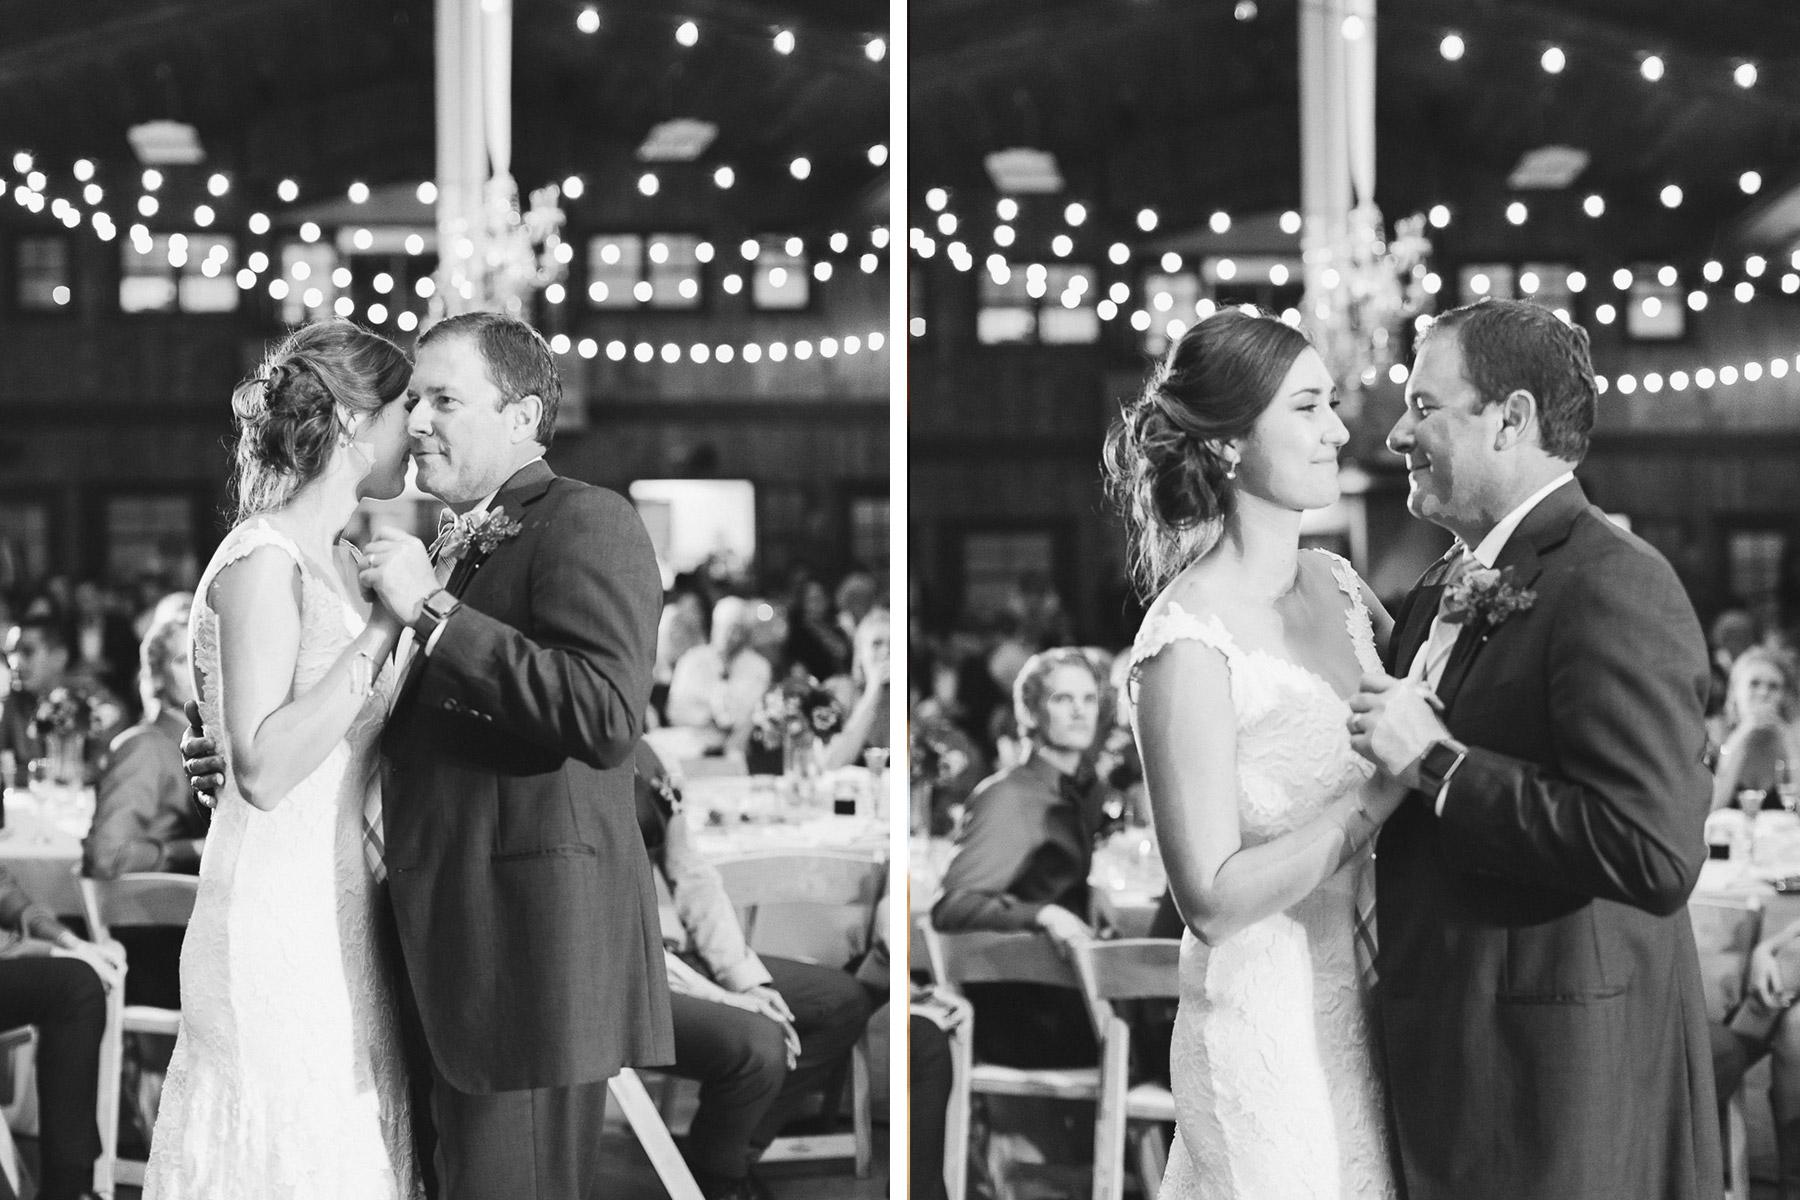 160902-Luxium-Weddings-Arizona-Michael-Becca-Spruce-Mountain-Ranch-Colorado-webres-109a.jpg